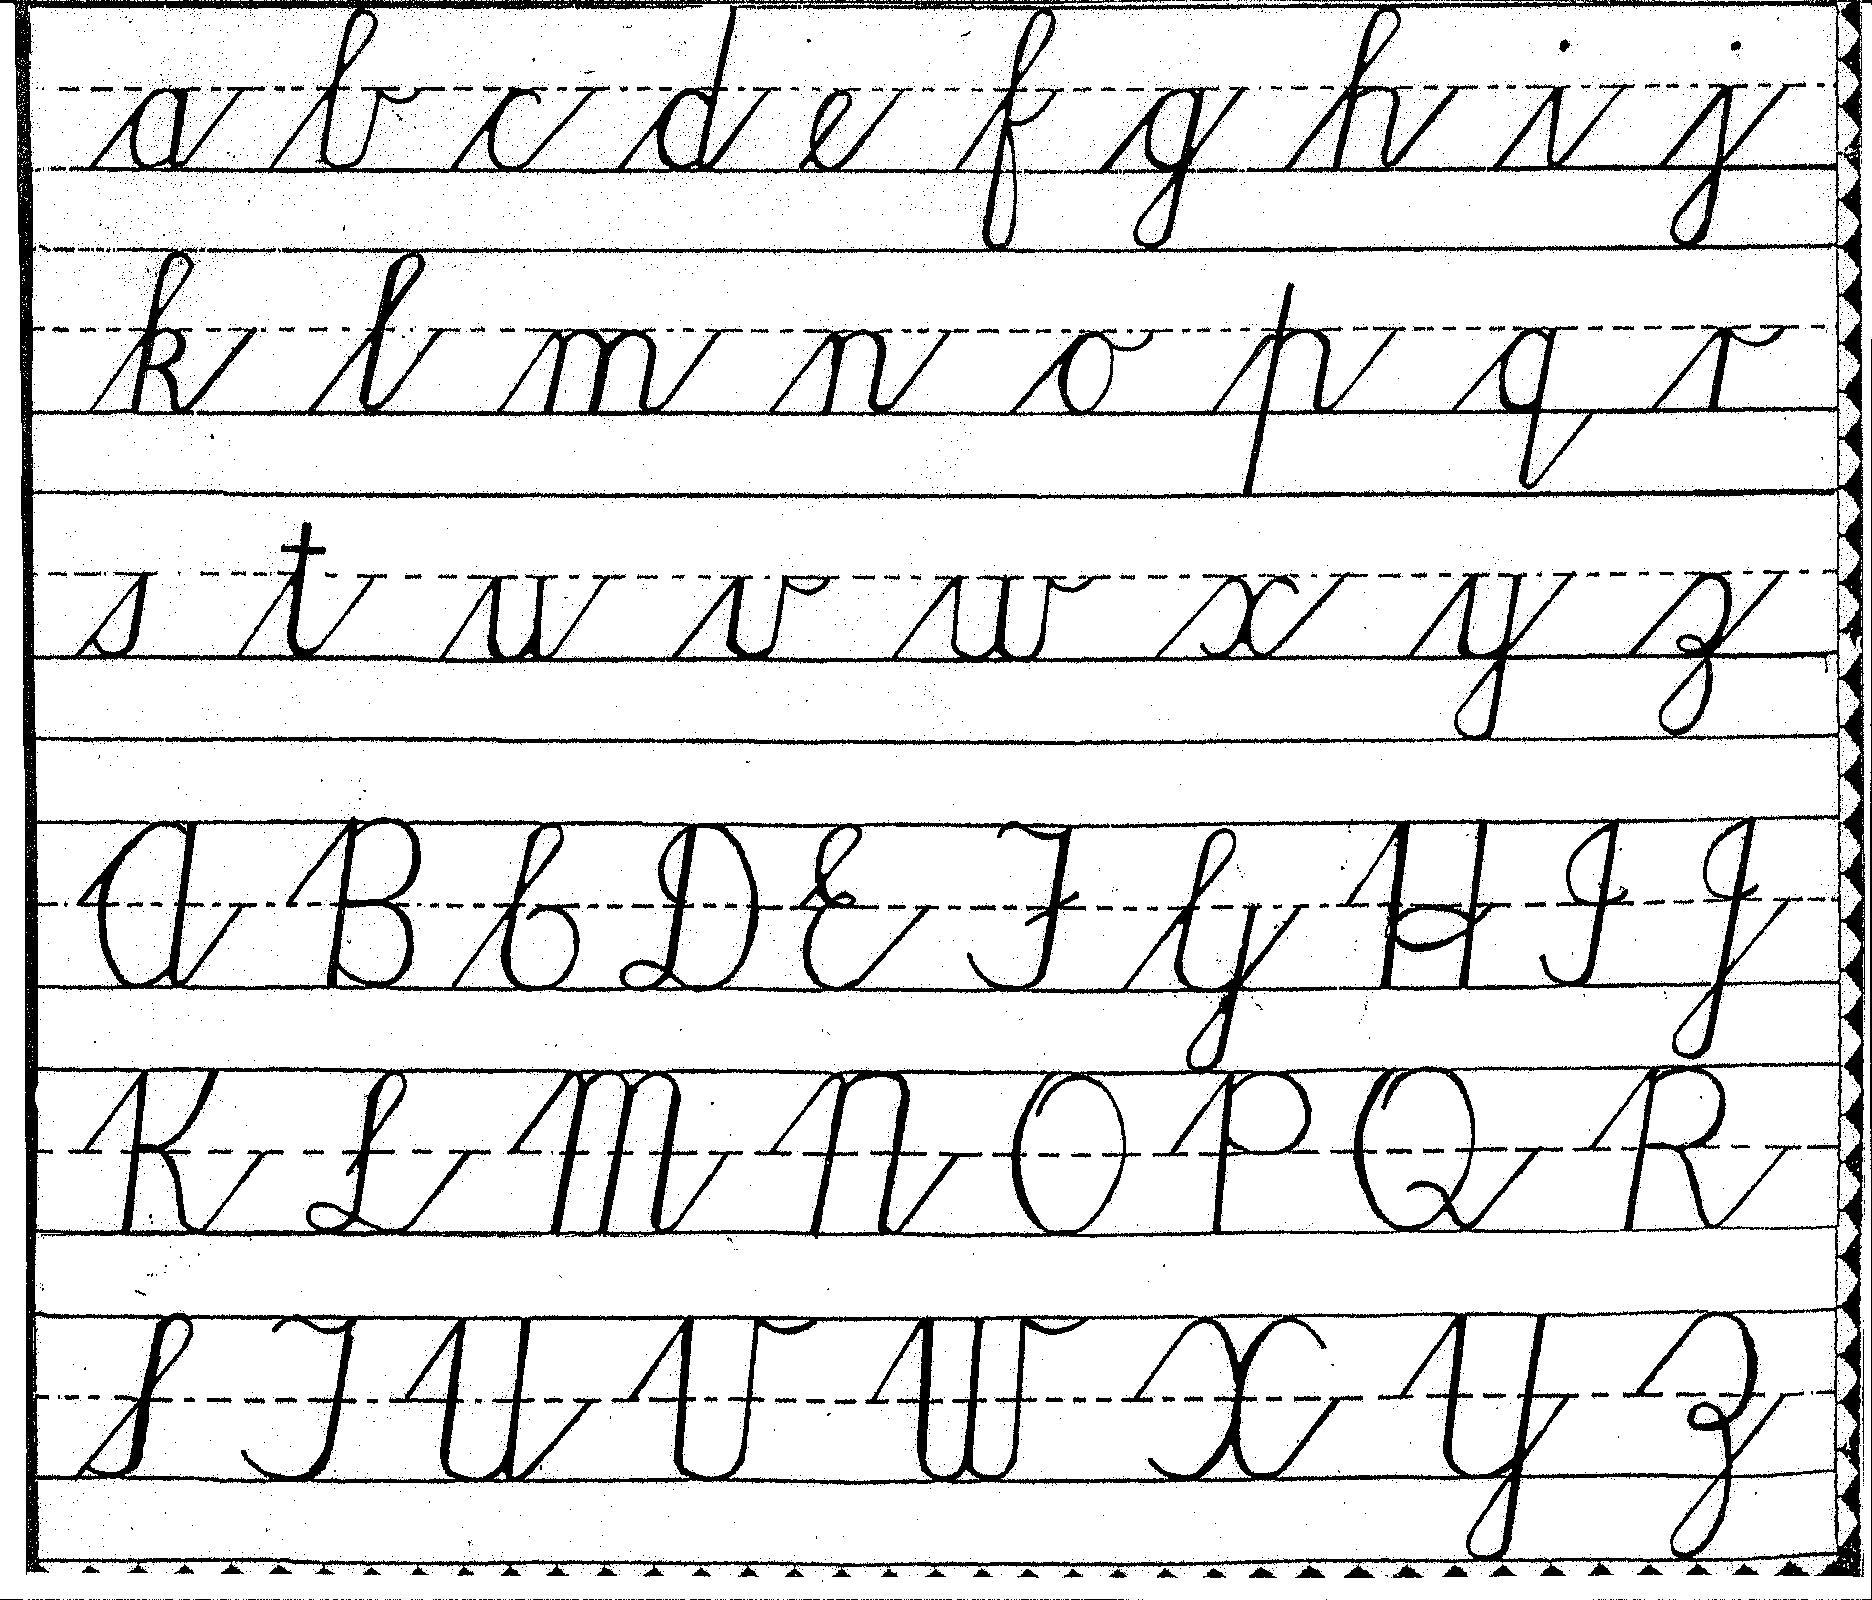 Worksheet ~ Marvelous Printable Cursive Alphabet Worksheets with regard to Alphabet Writing Worksheets Uk